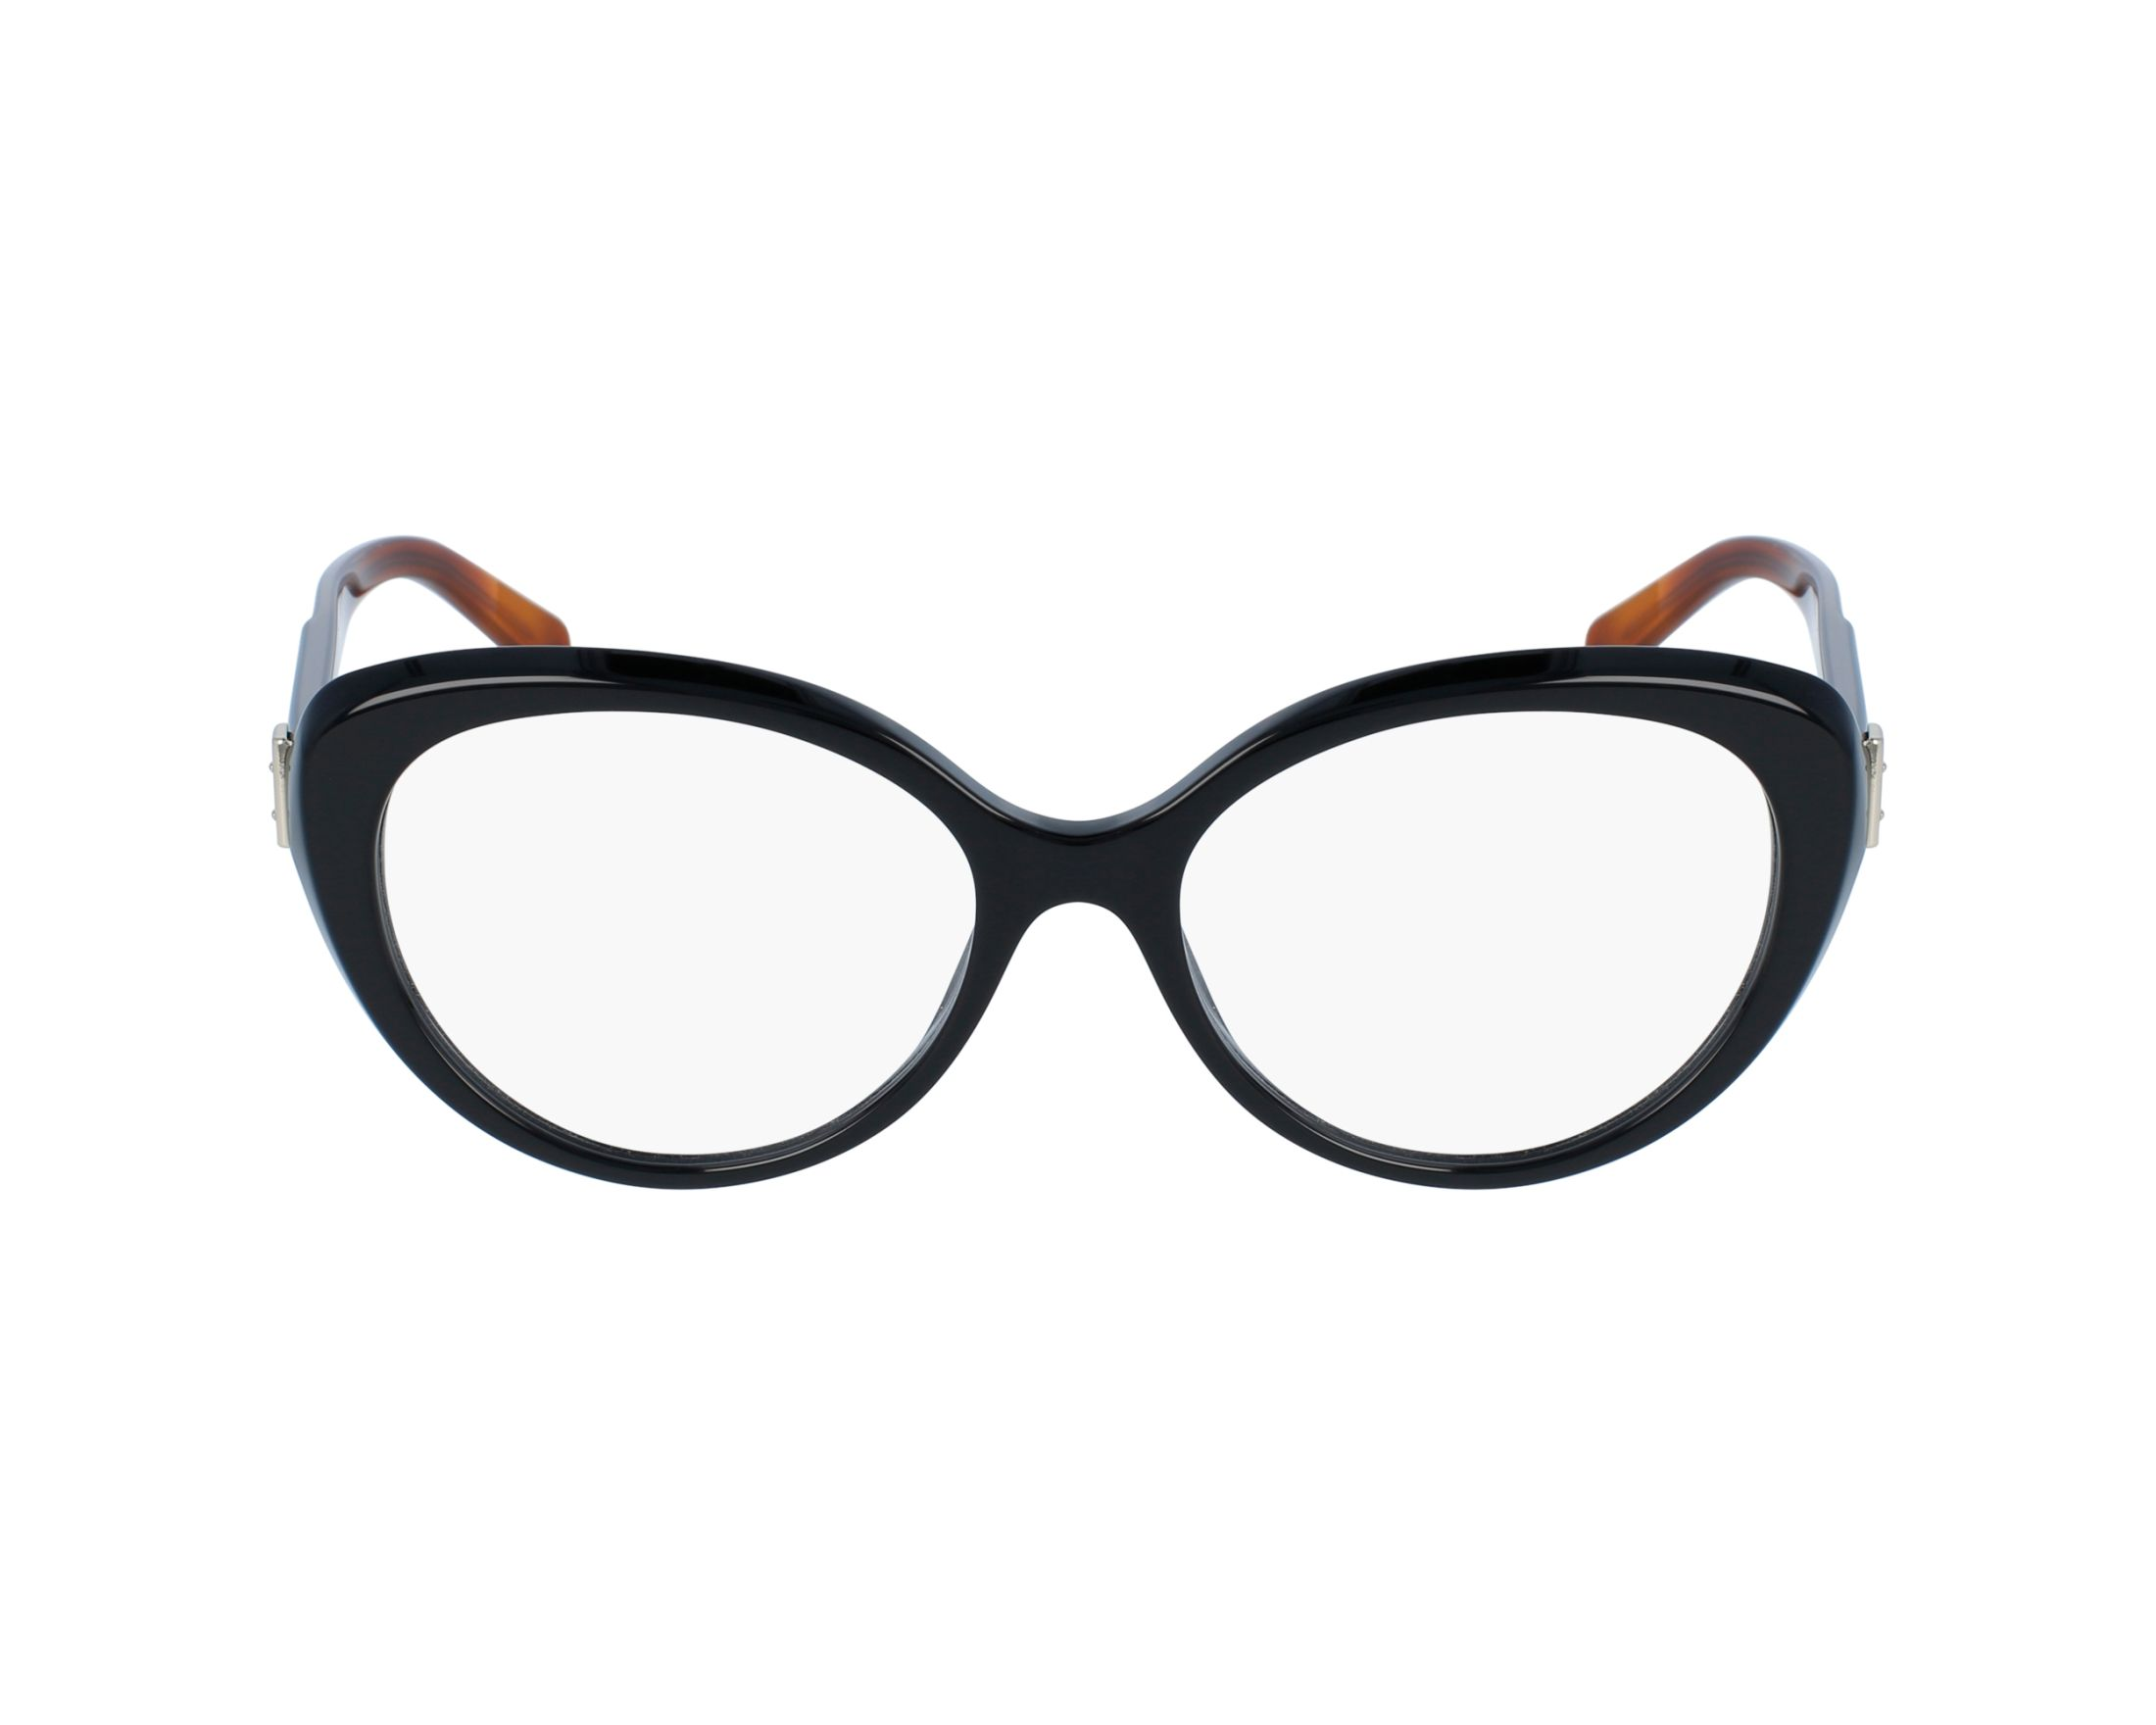 fdf0acc5f12 eyeglasses Burberry BE-2251 3637 53-16 Black Brown profile view